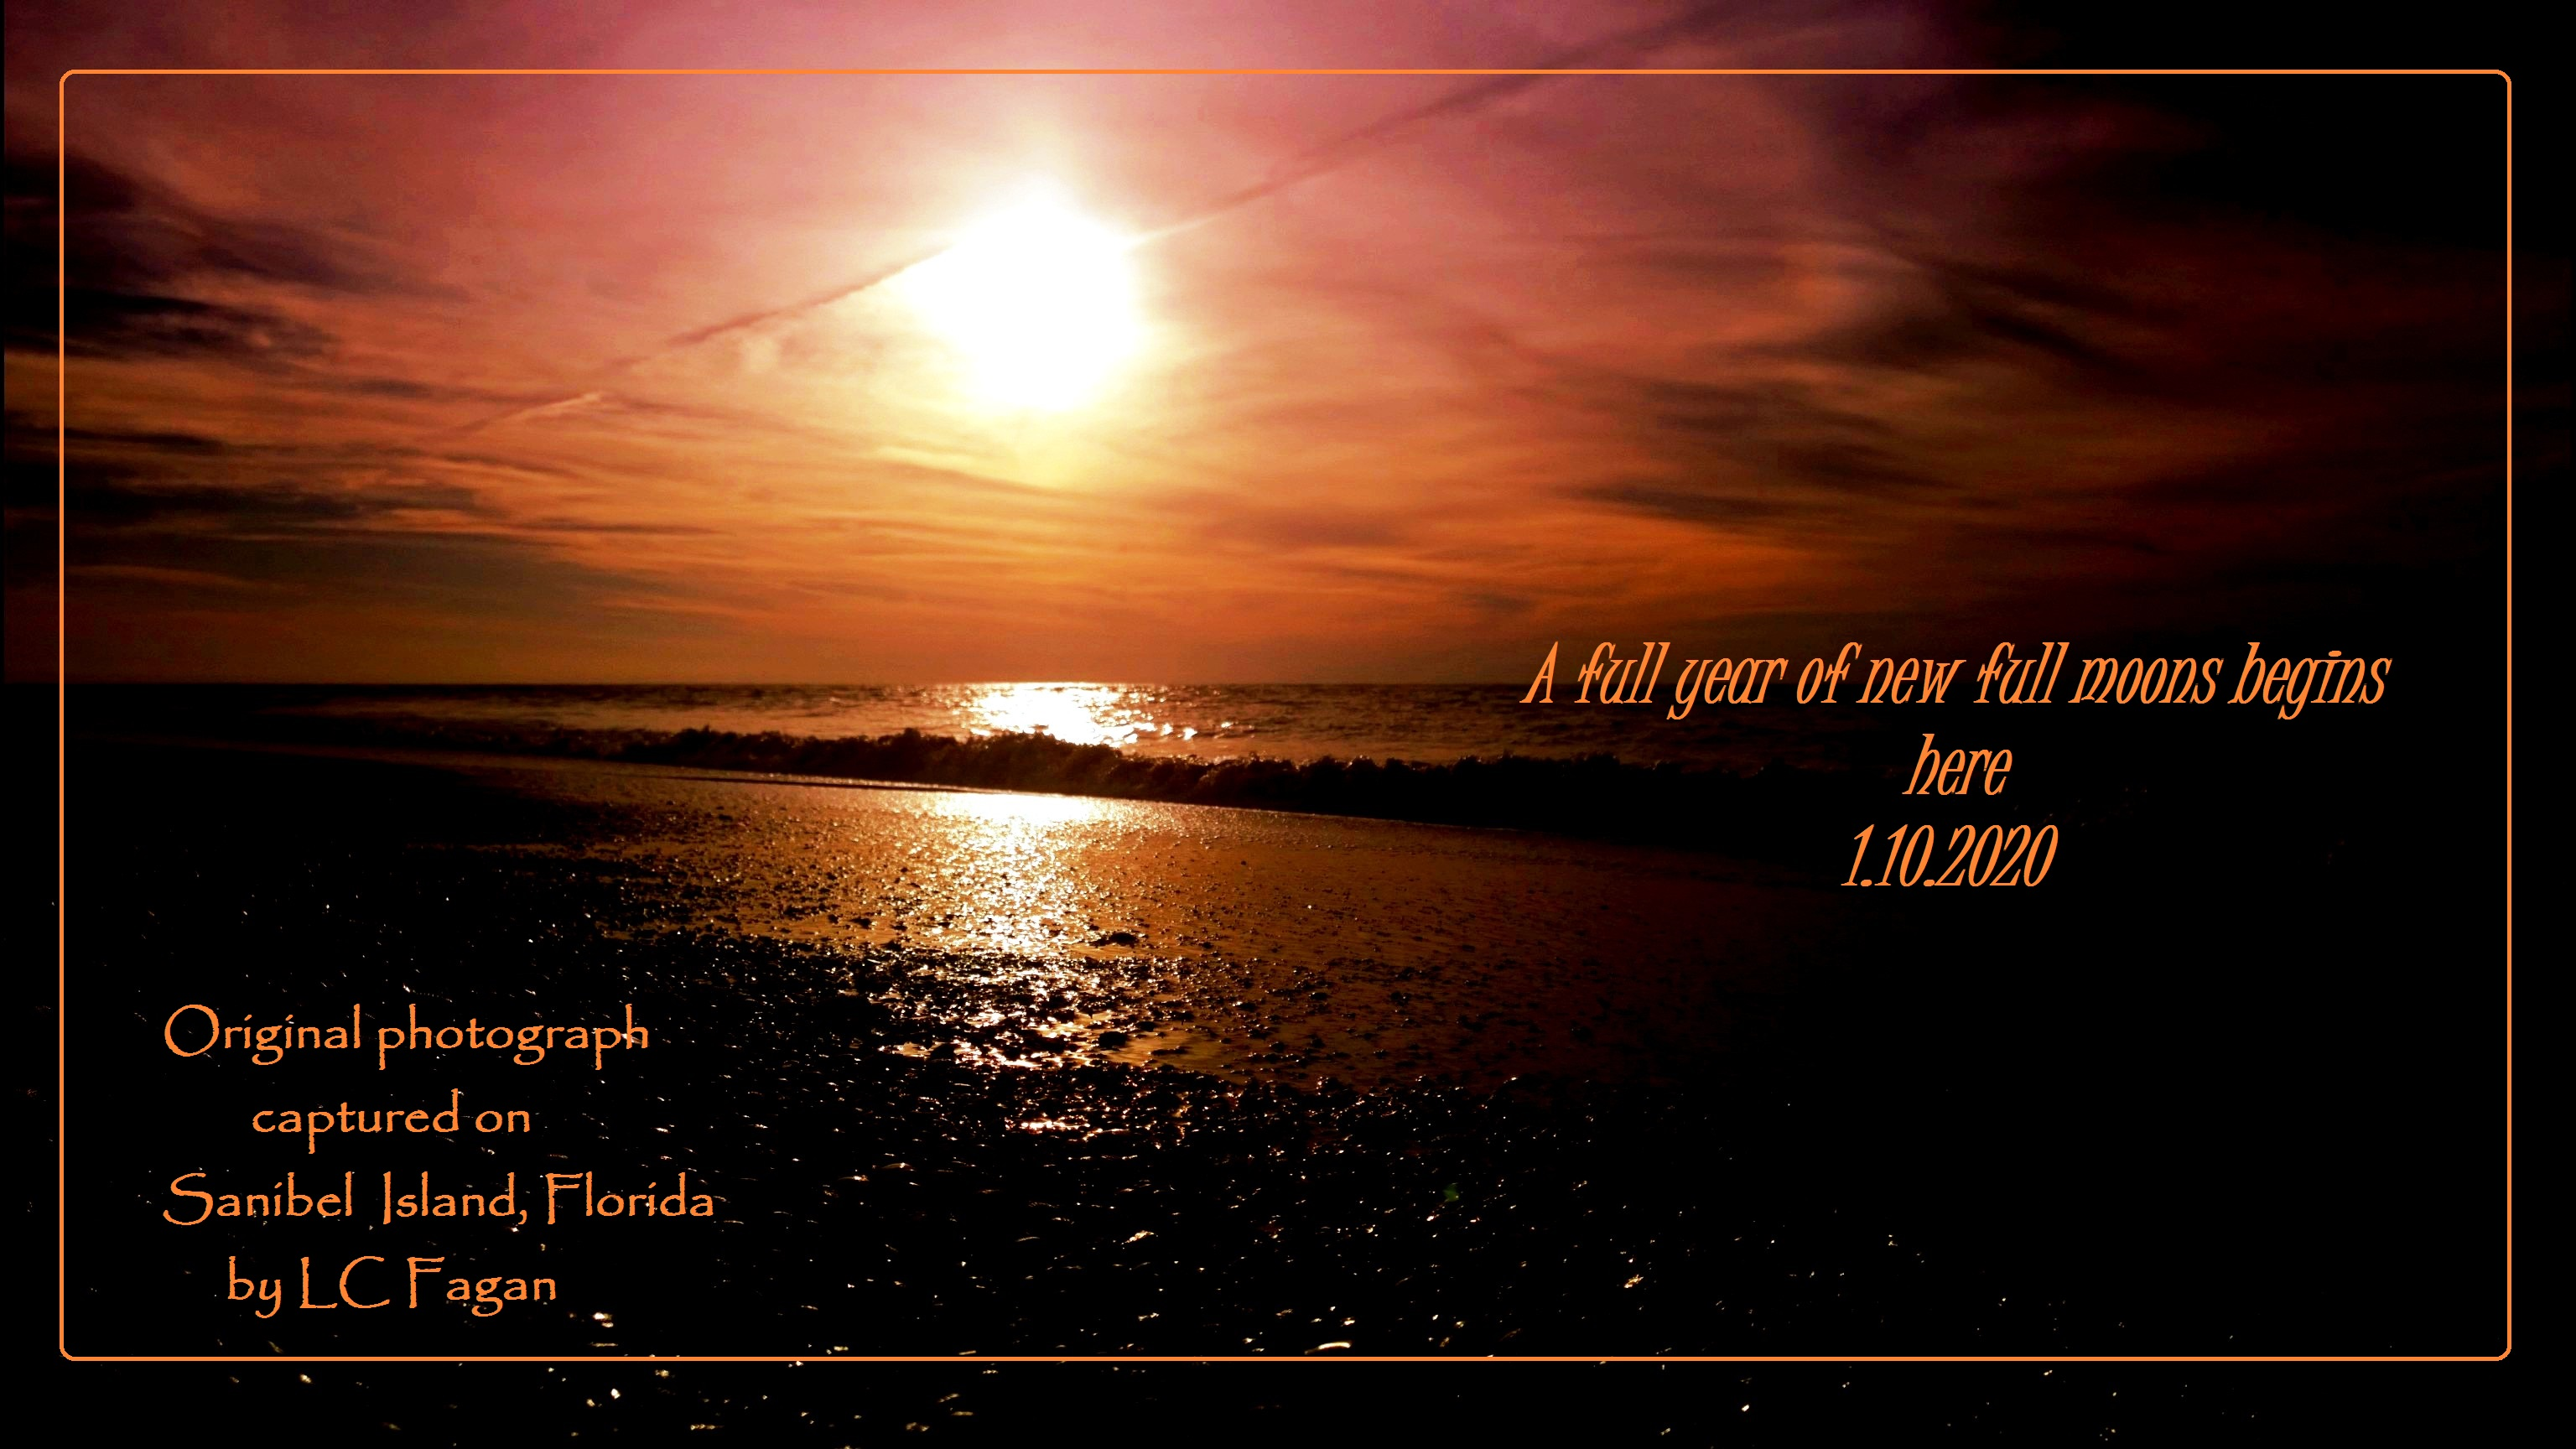 A Brand new Beach 1.10.2020